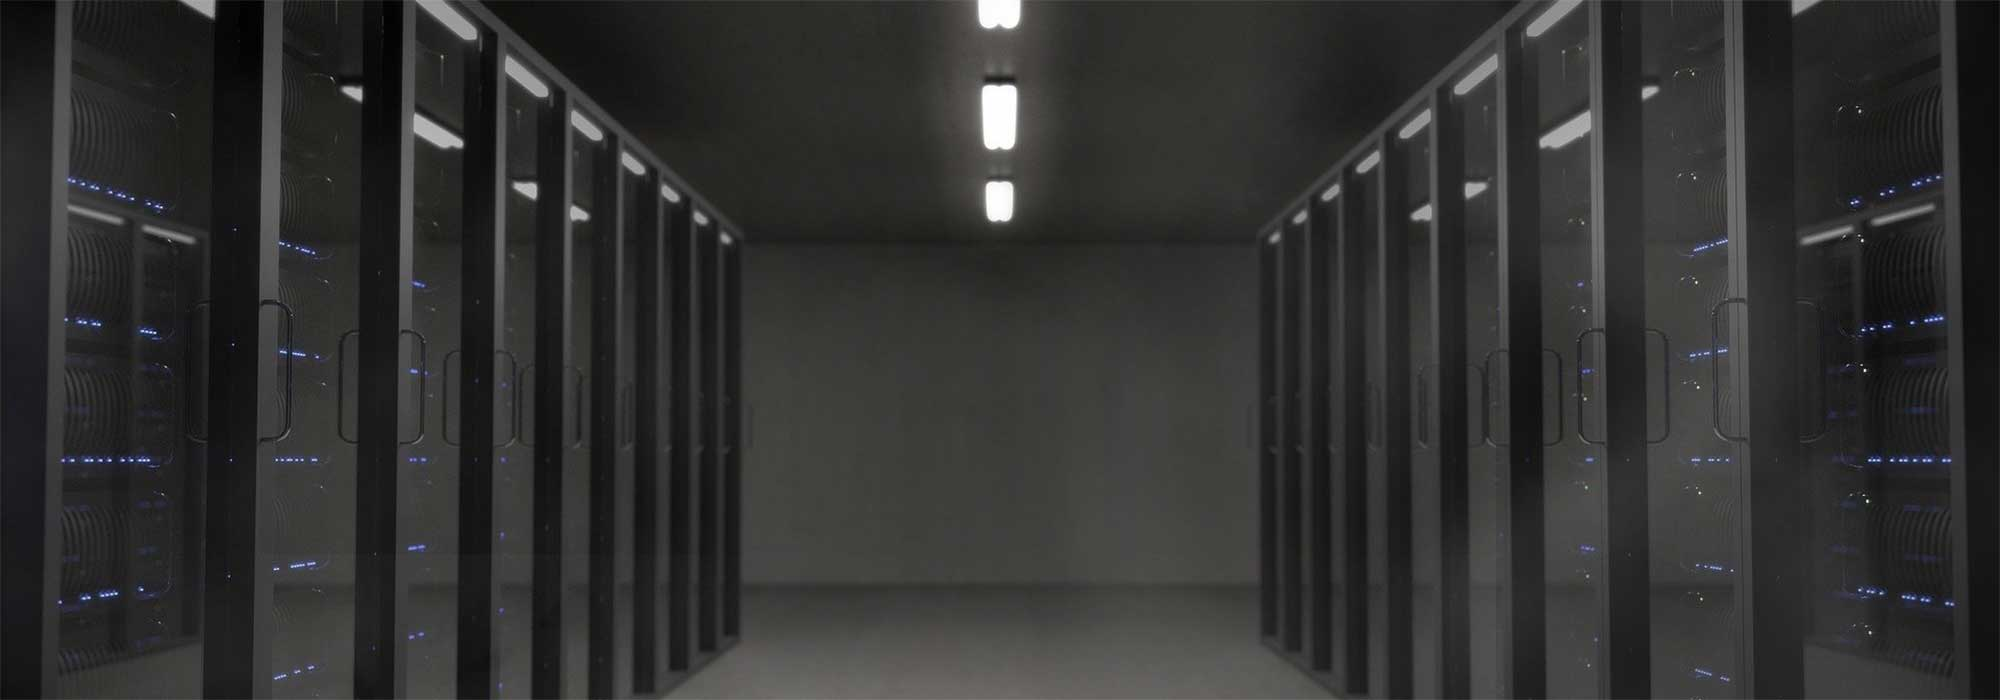 Data Servers